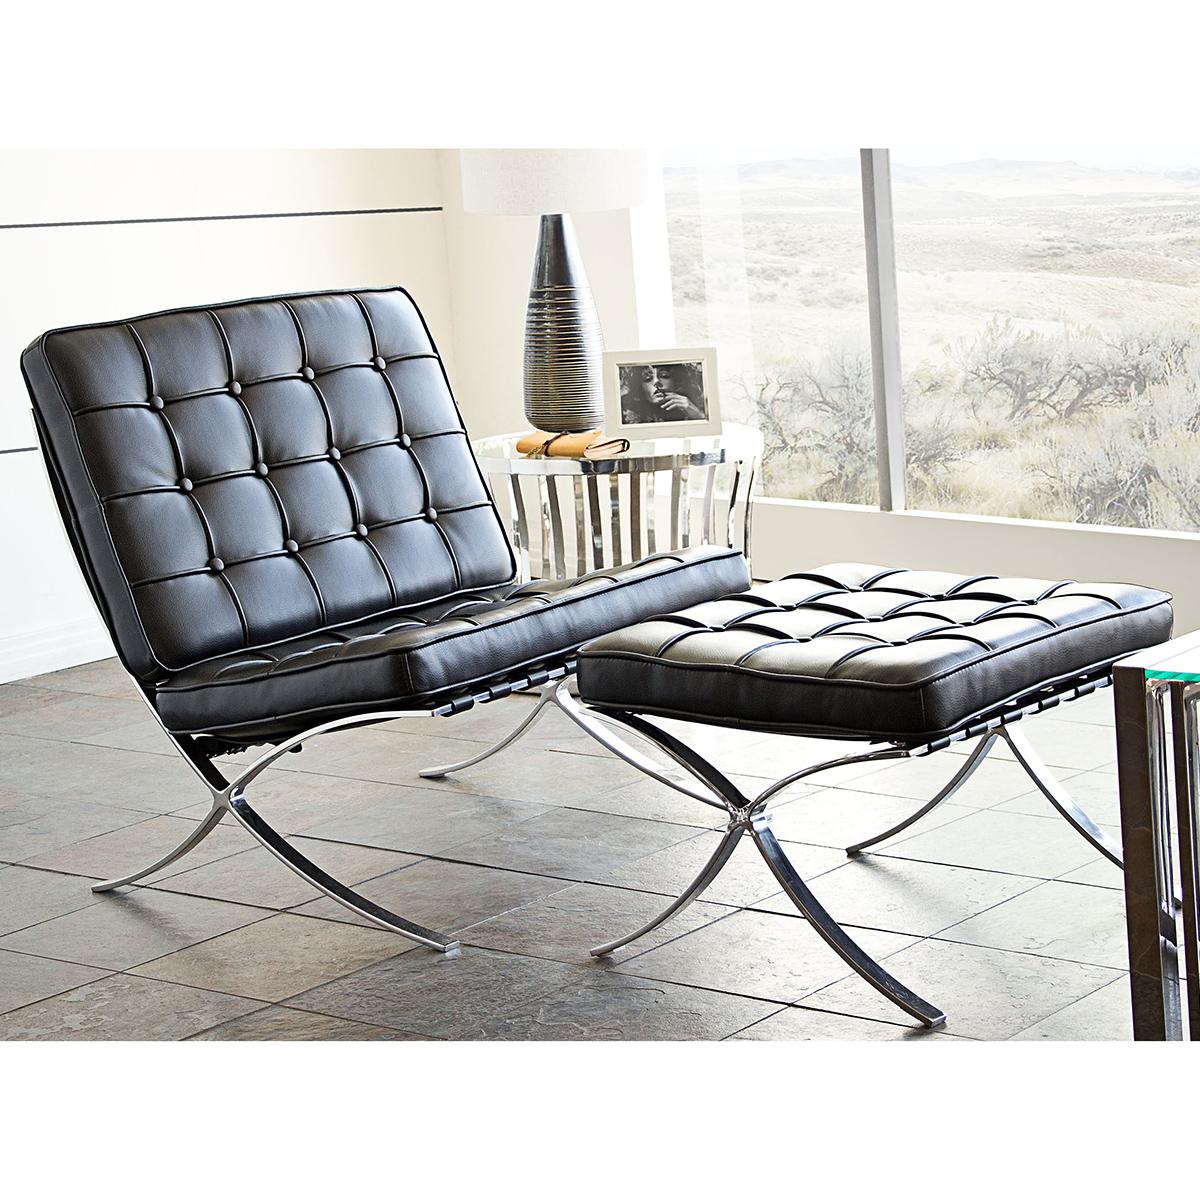 Charmant Diamond Sofa Cordoba Tufted Chair U0026 Ottoman Set W/ Stainless Steel Frame In  Black Leather